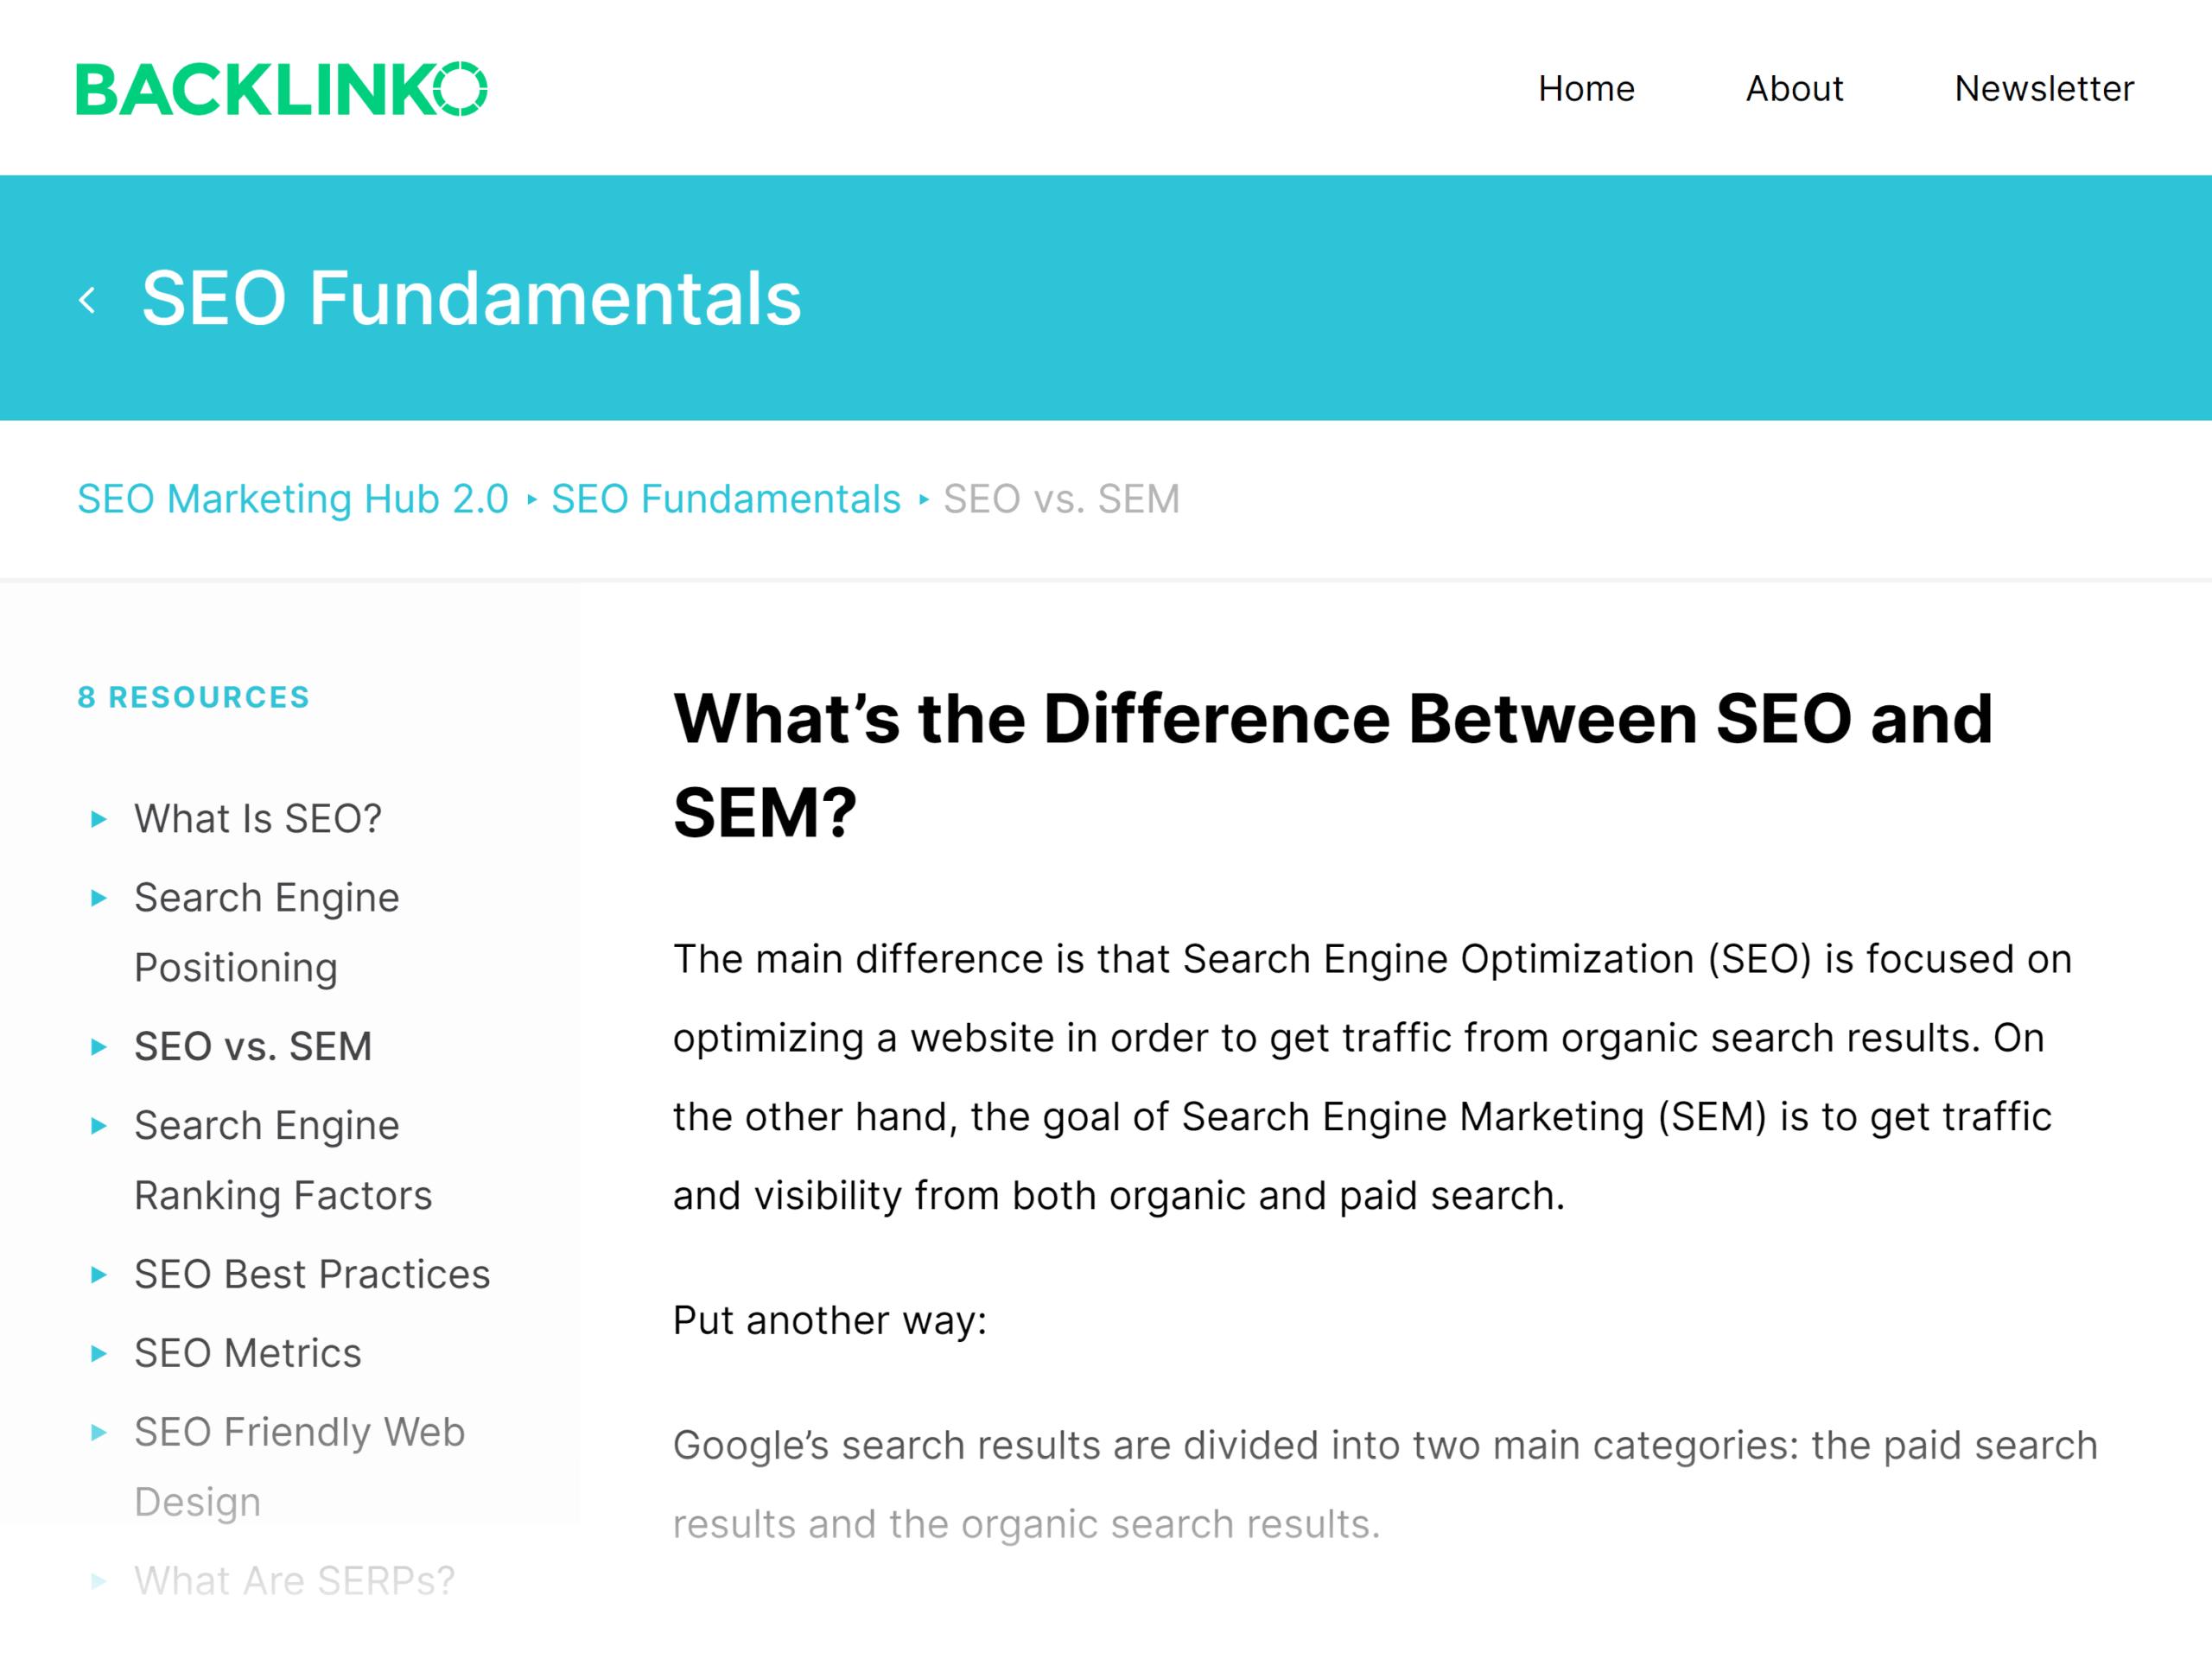 Backlinko – SEO Hub – SEO vs. SEM